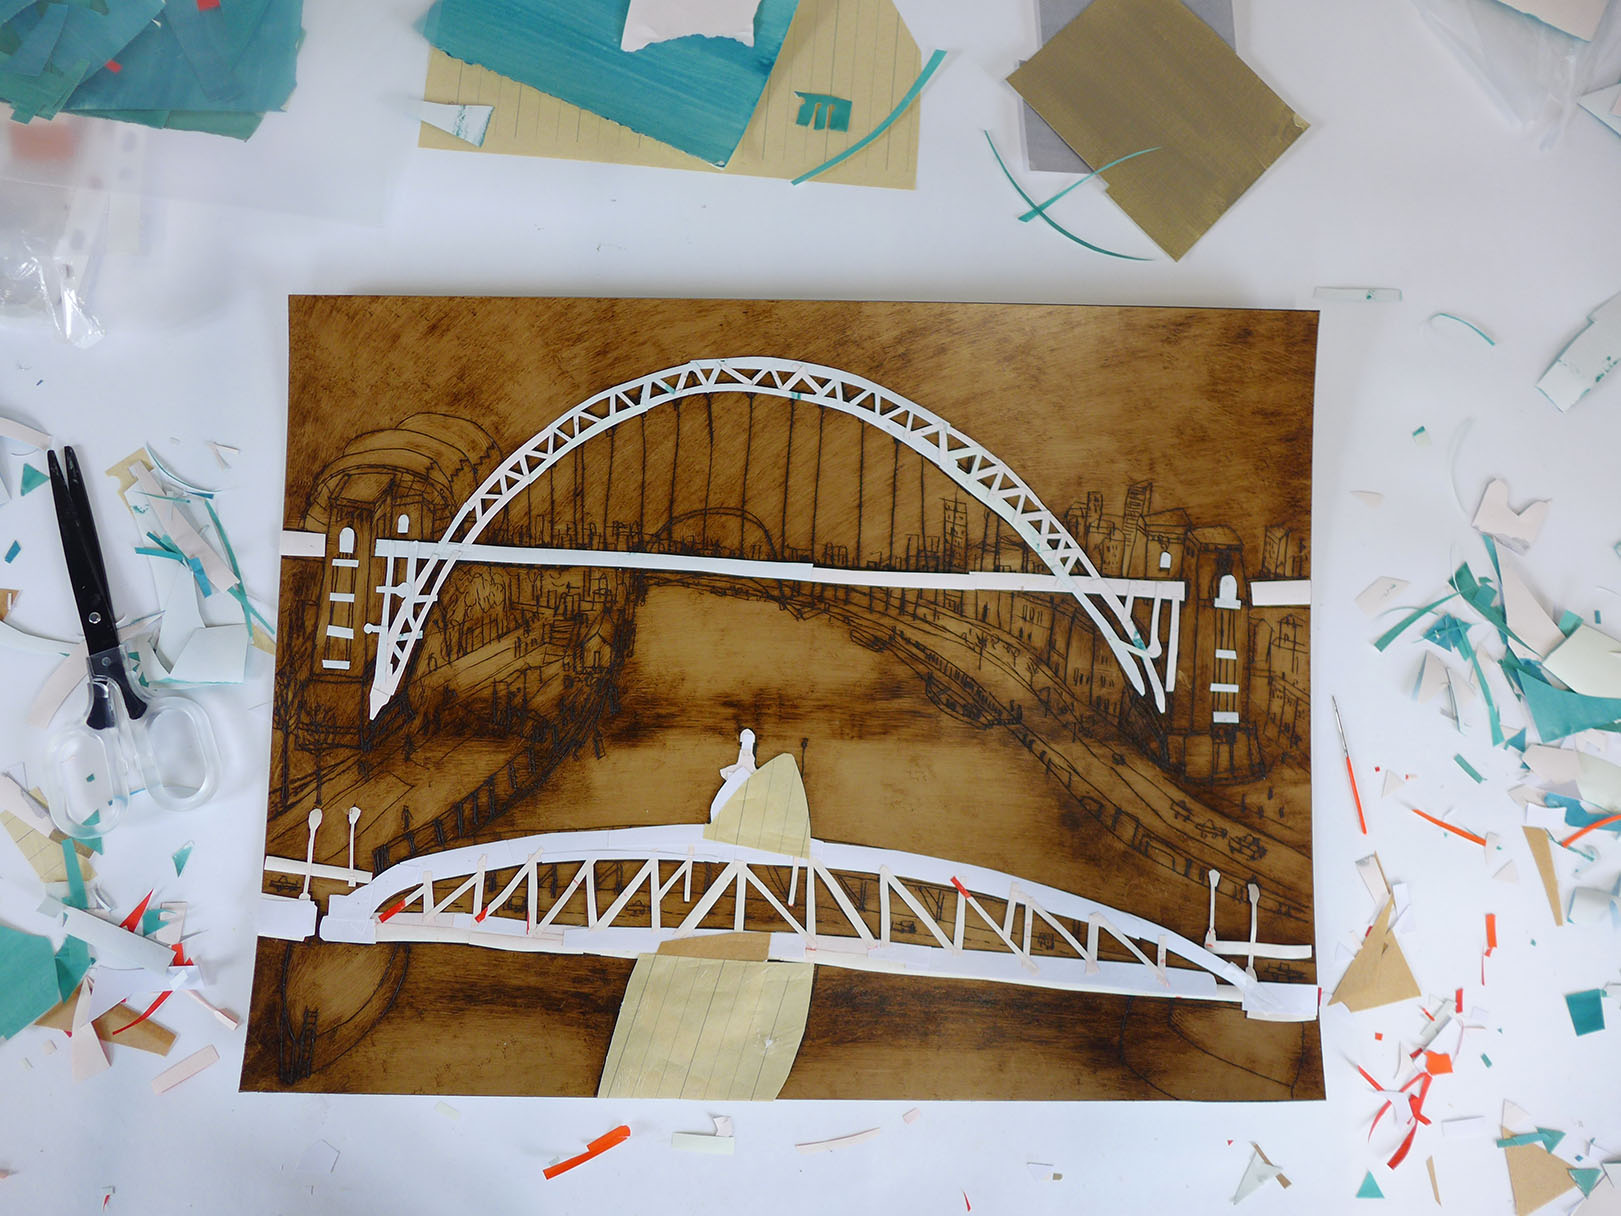 tyne_bridge_5_clare_caulfield.jpg